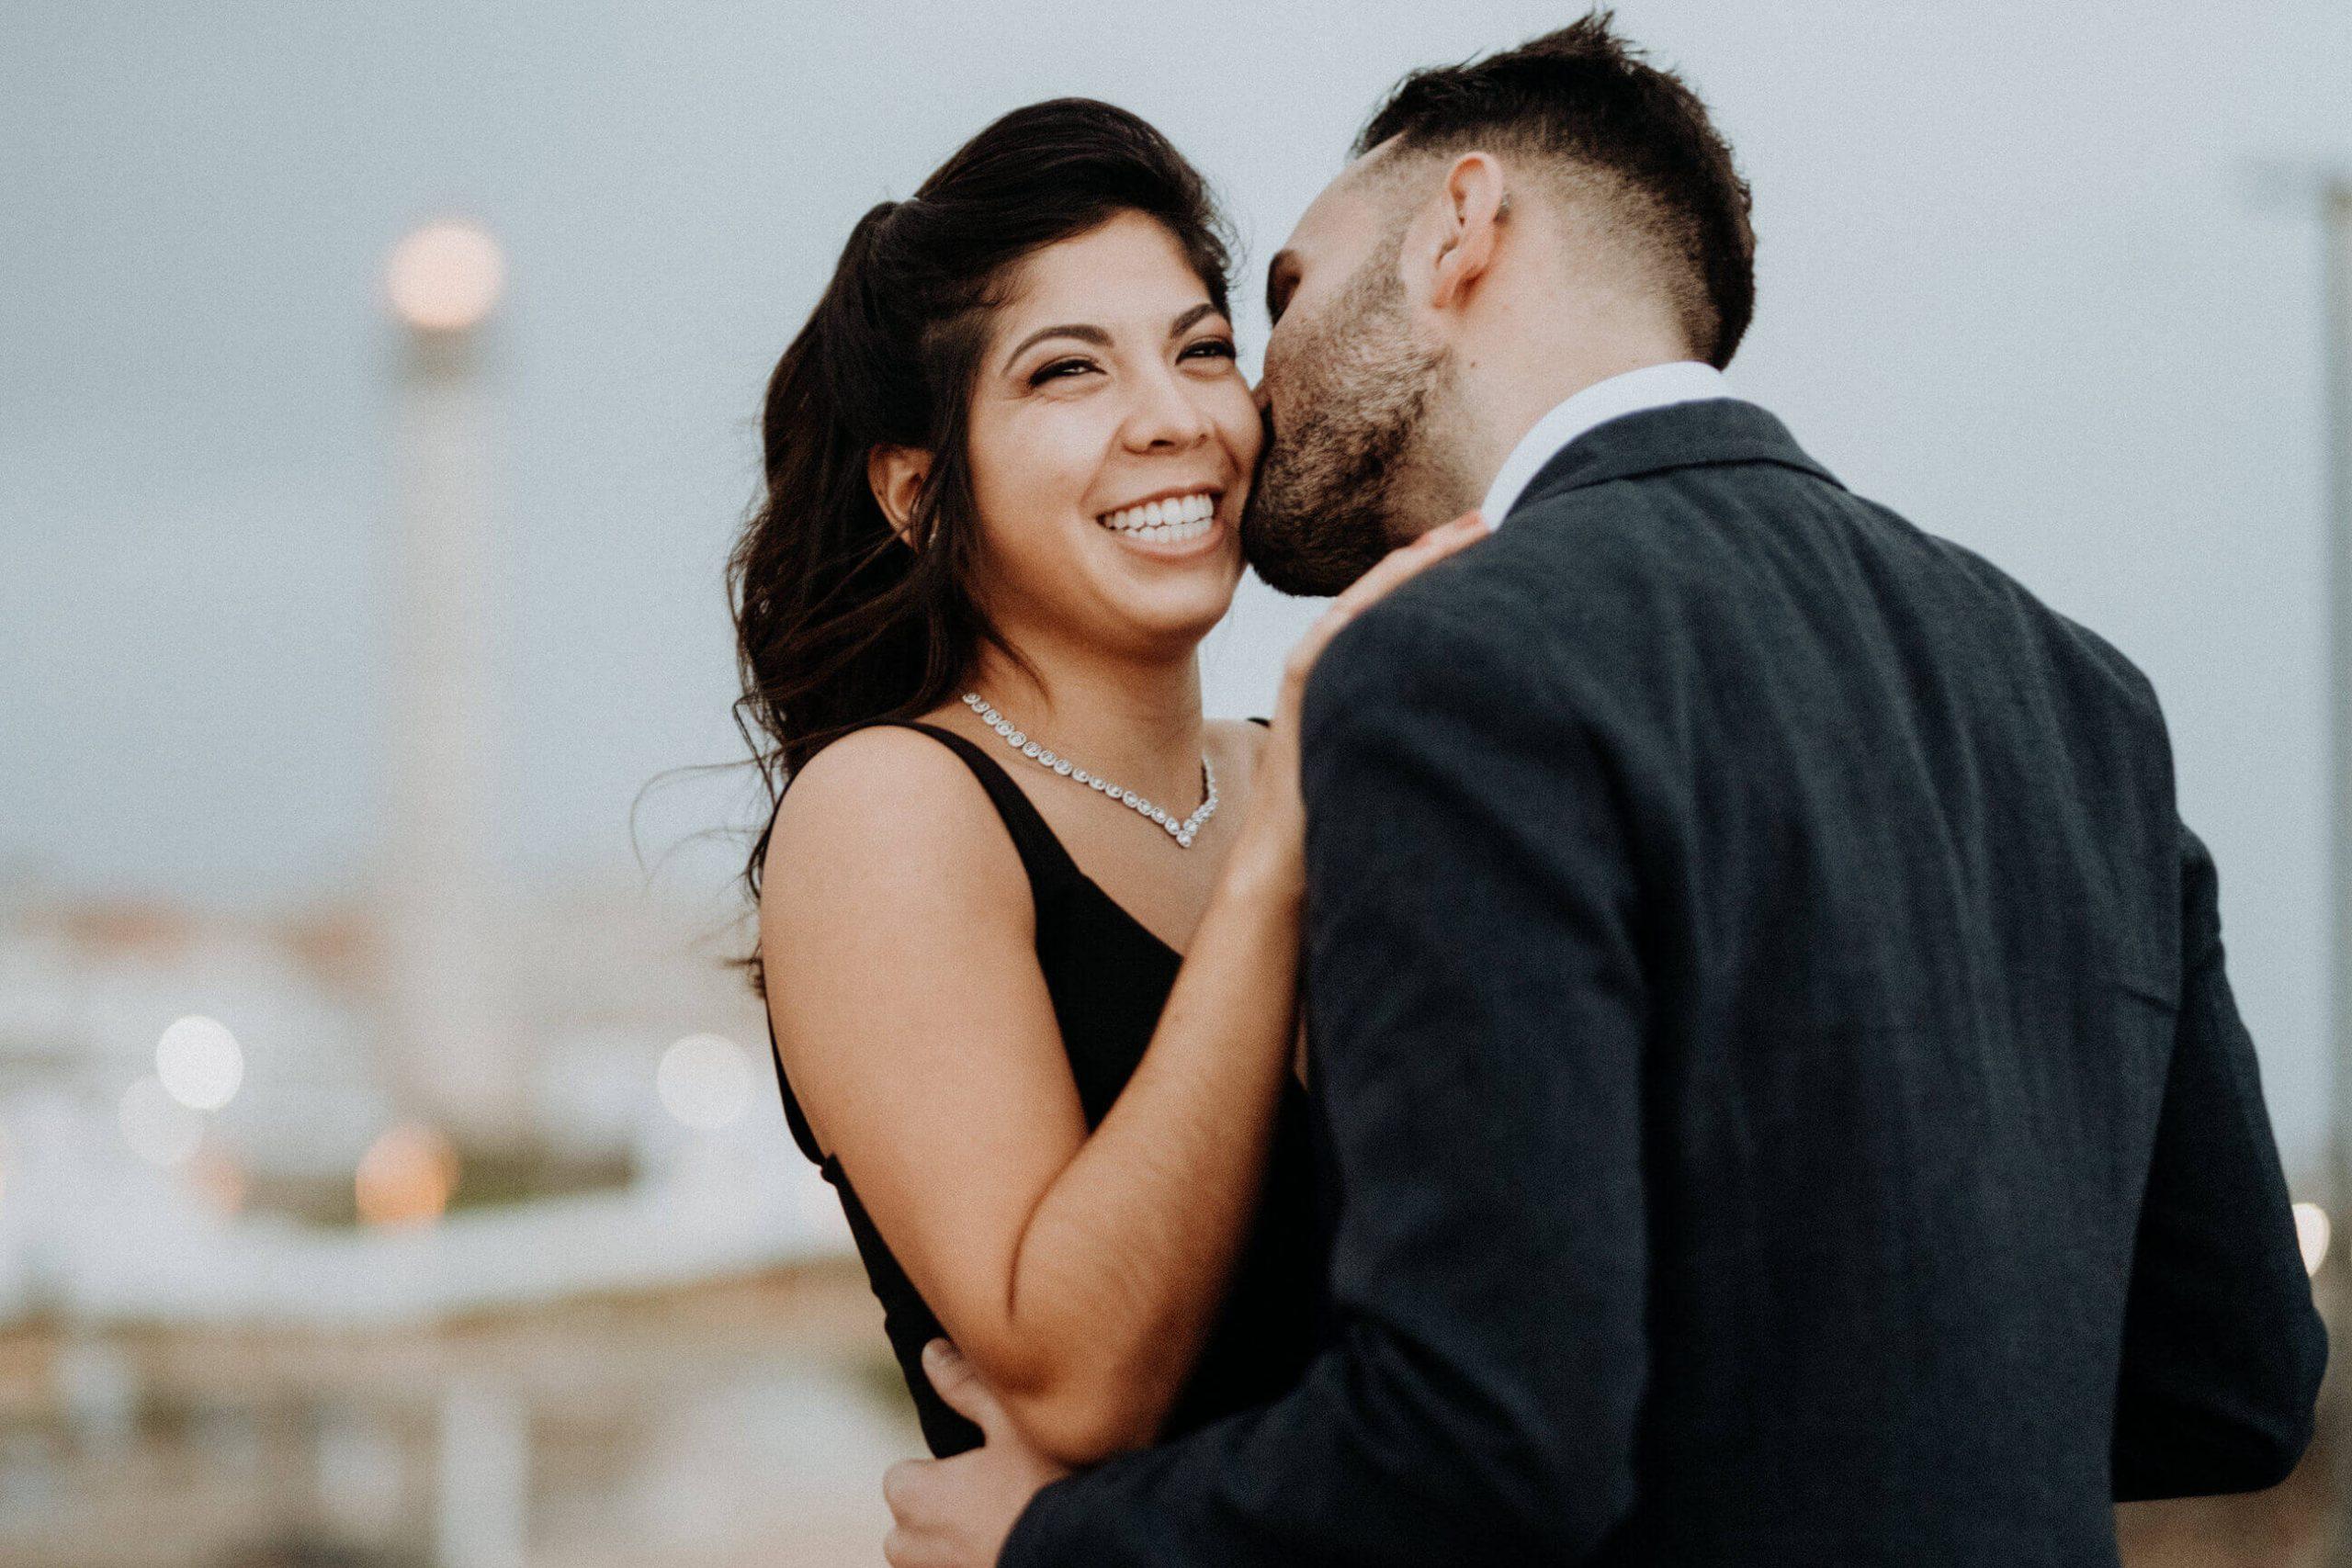 roma-organizacao-eventos-pedido-casamento-casa-de-cha-da-boa-nova-porto-portugal-24